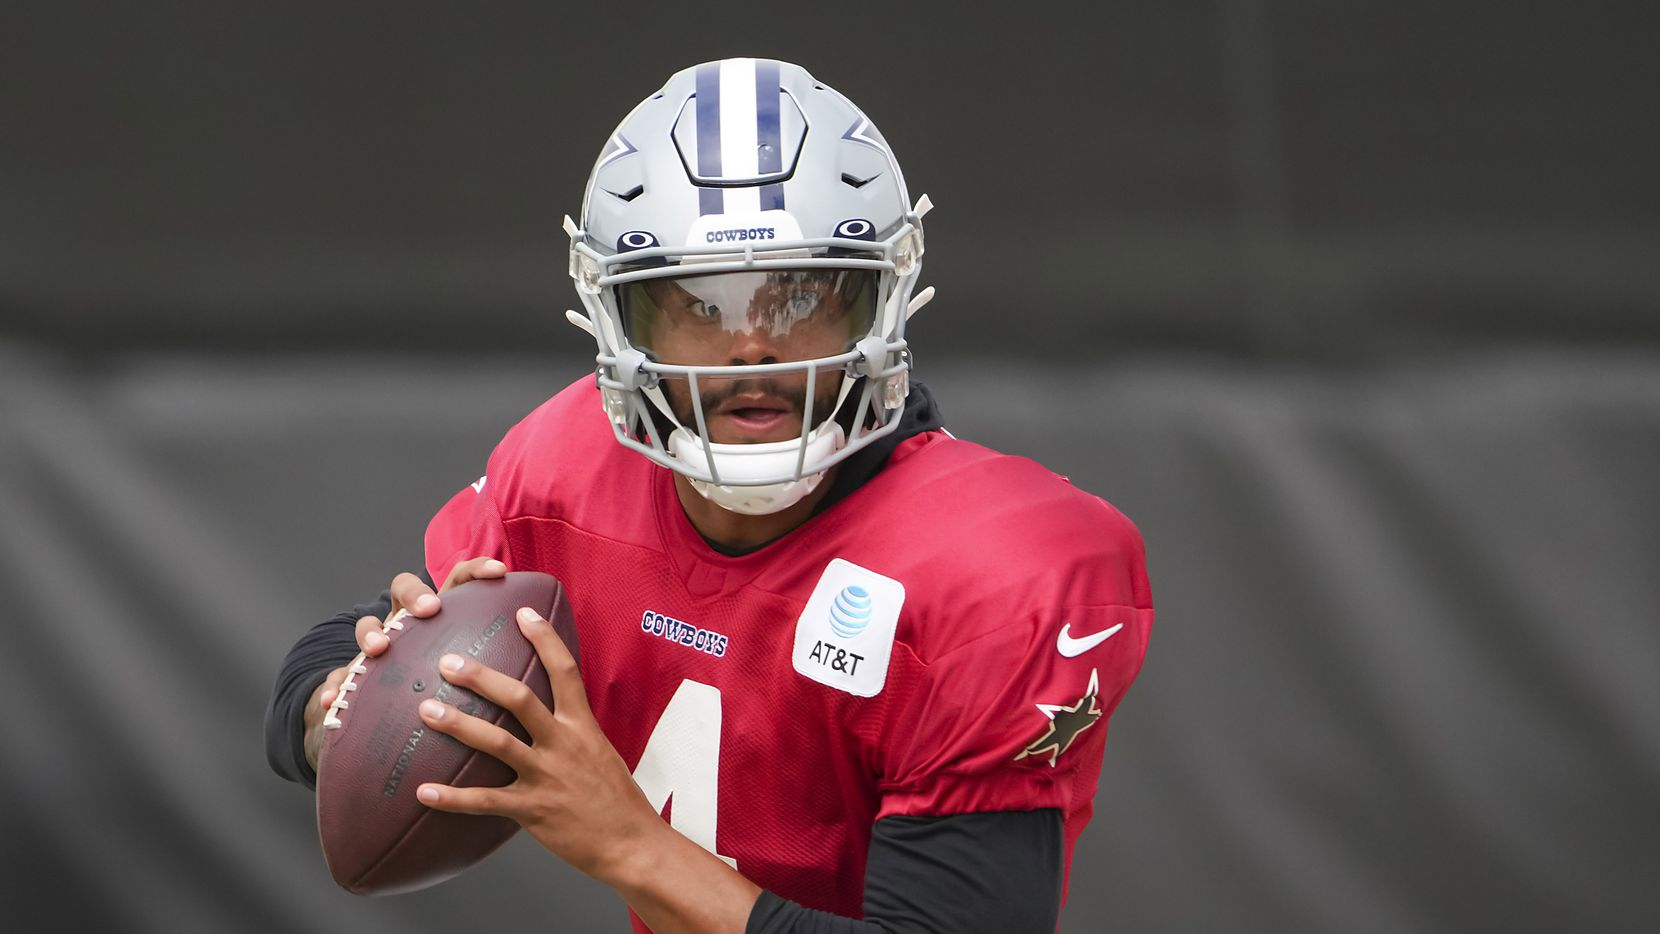 Dallas Cowboys quarterback Dak Prescott (4) runs a drill during a practice at training camp on Saturday, July 31, 2021, in Oxnard, Calif.